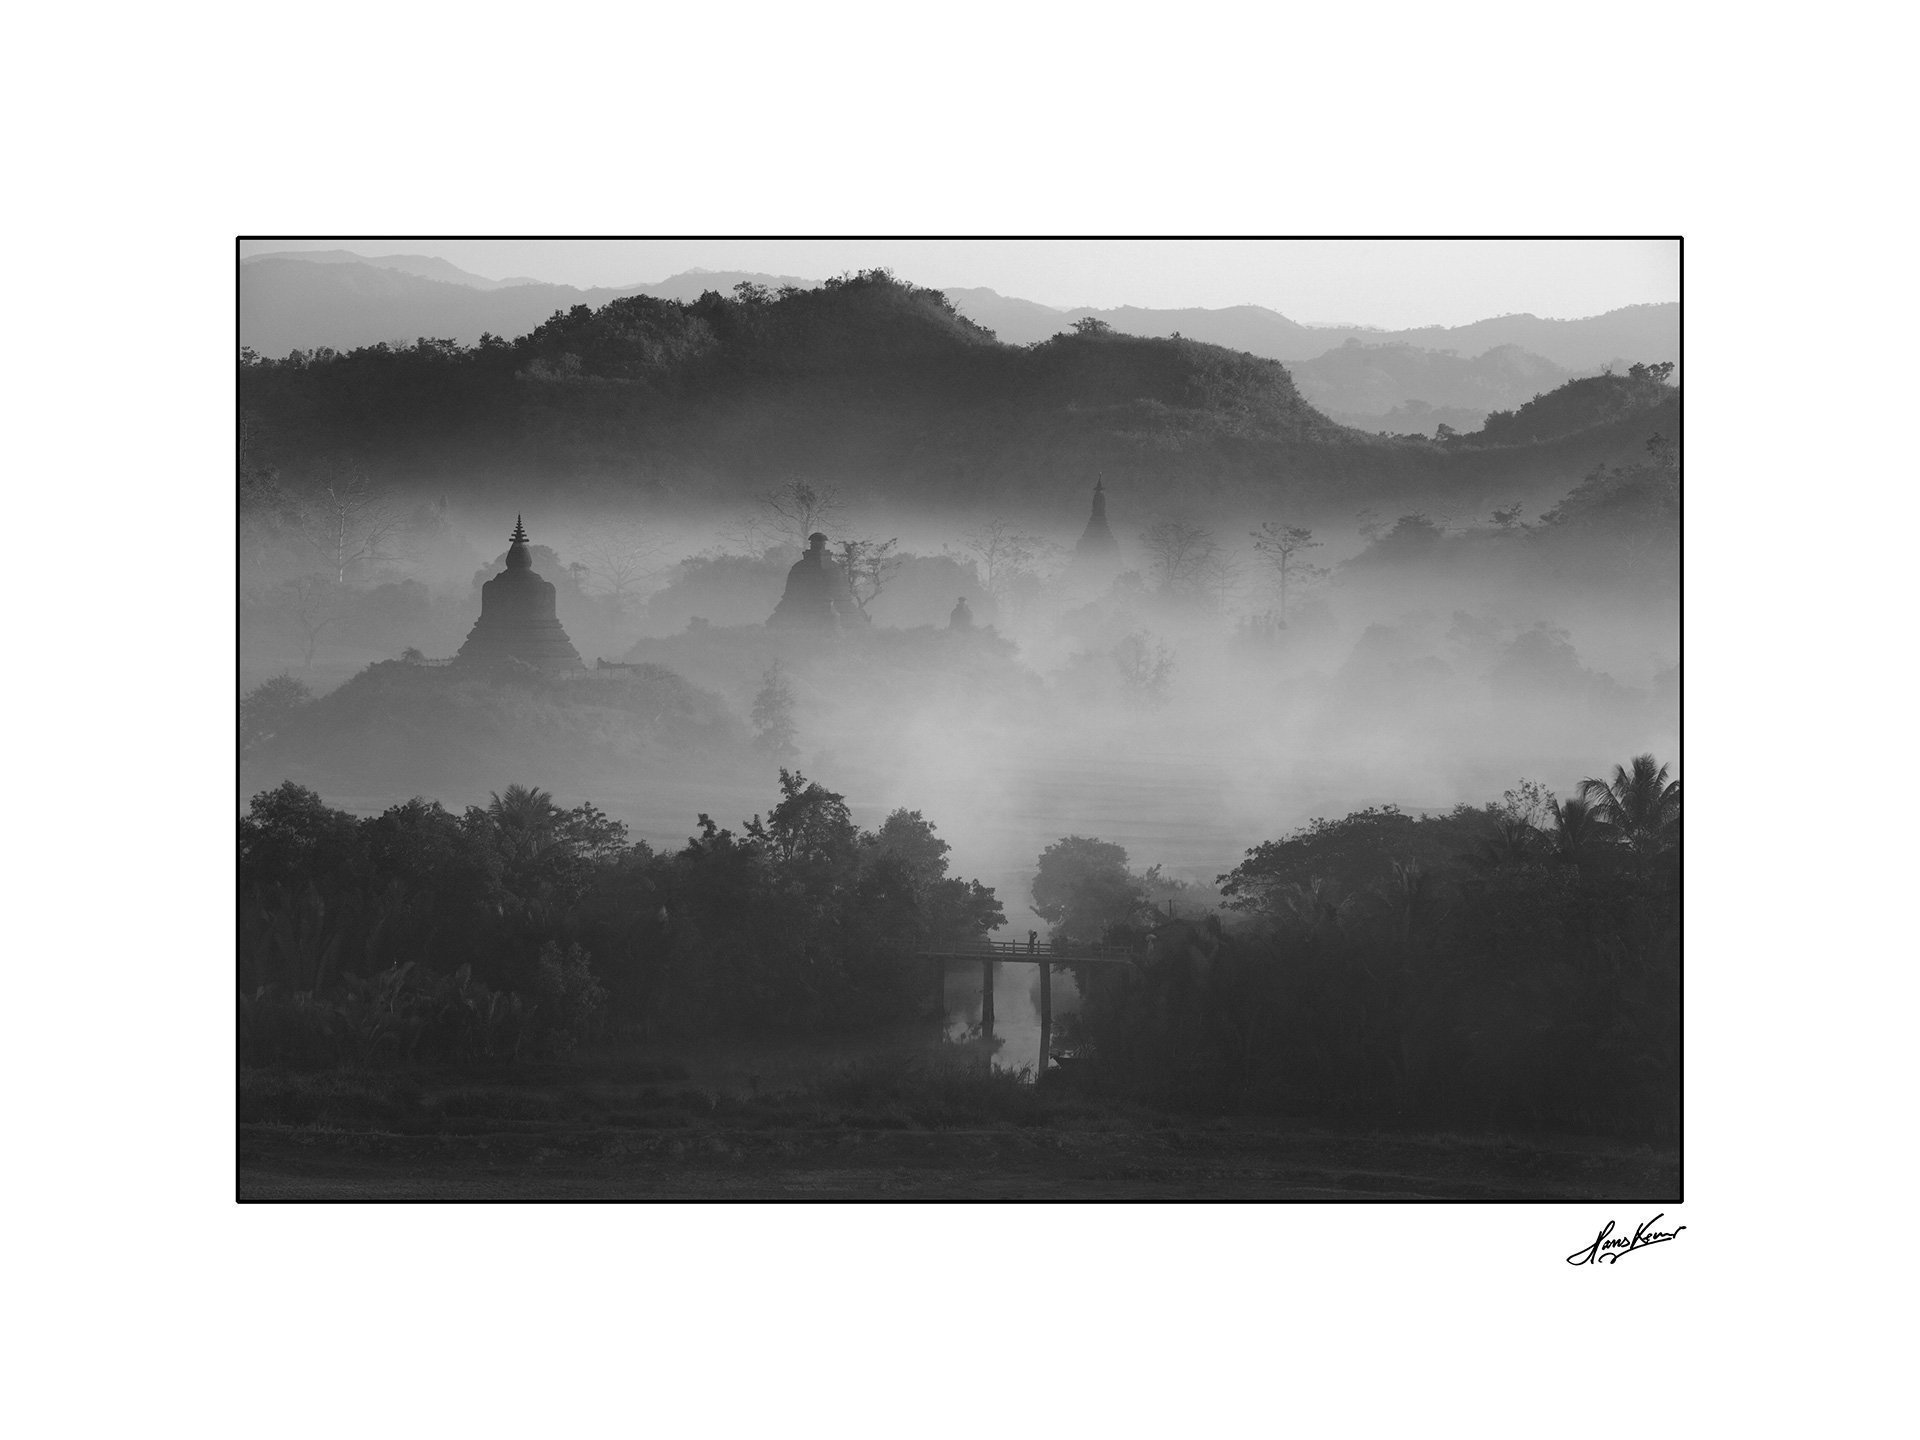 Morning mist, Mrauk U, Myanmar, 2012